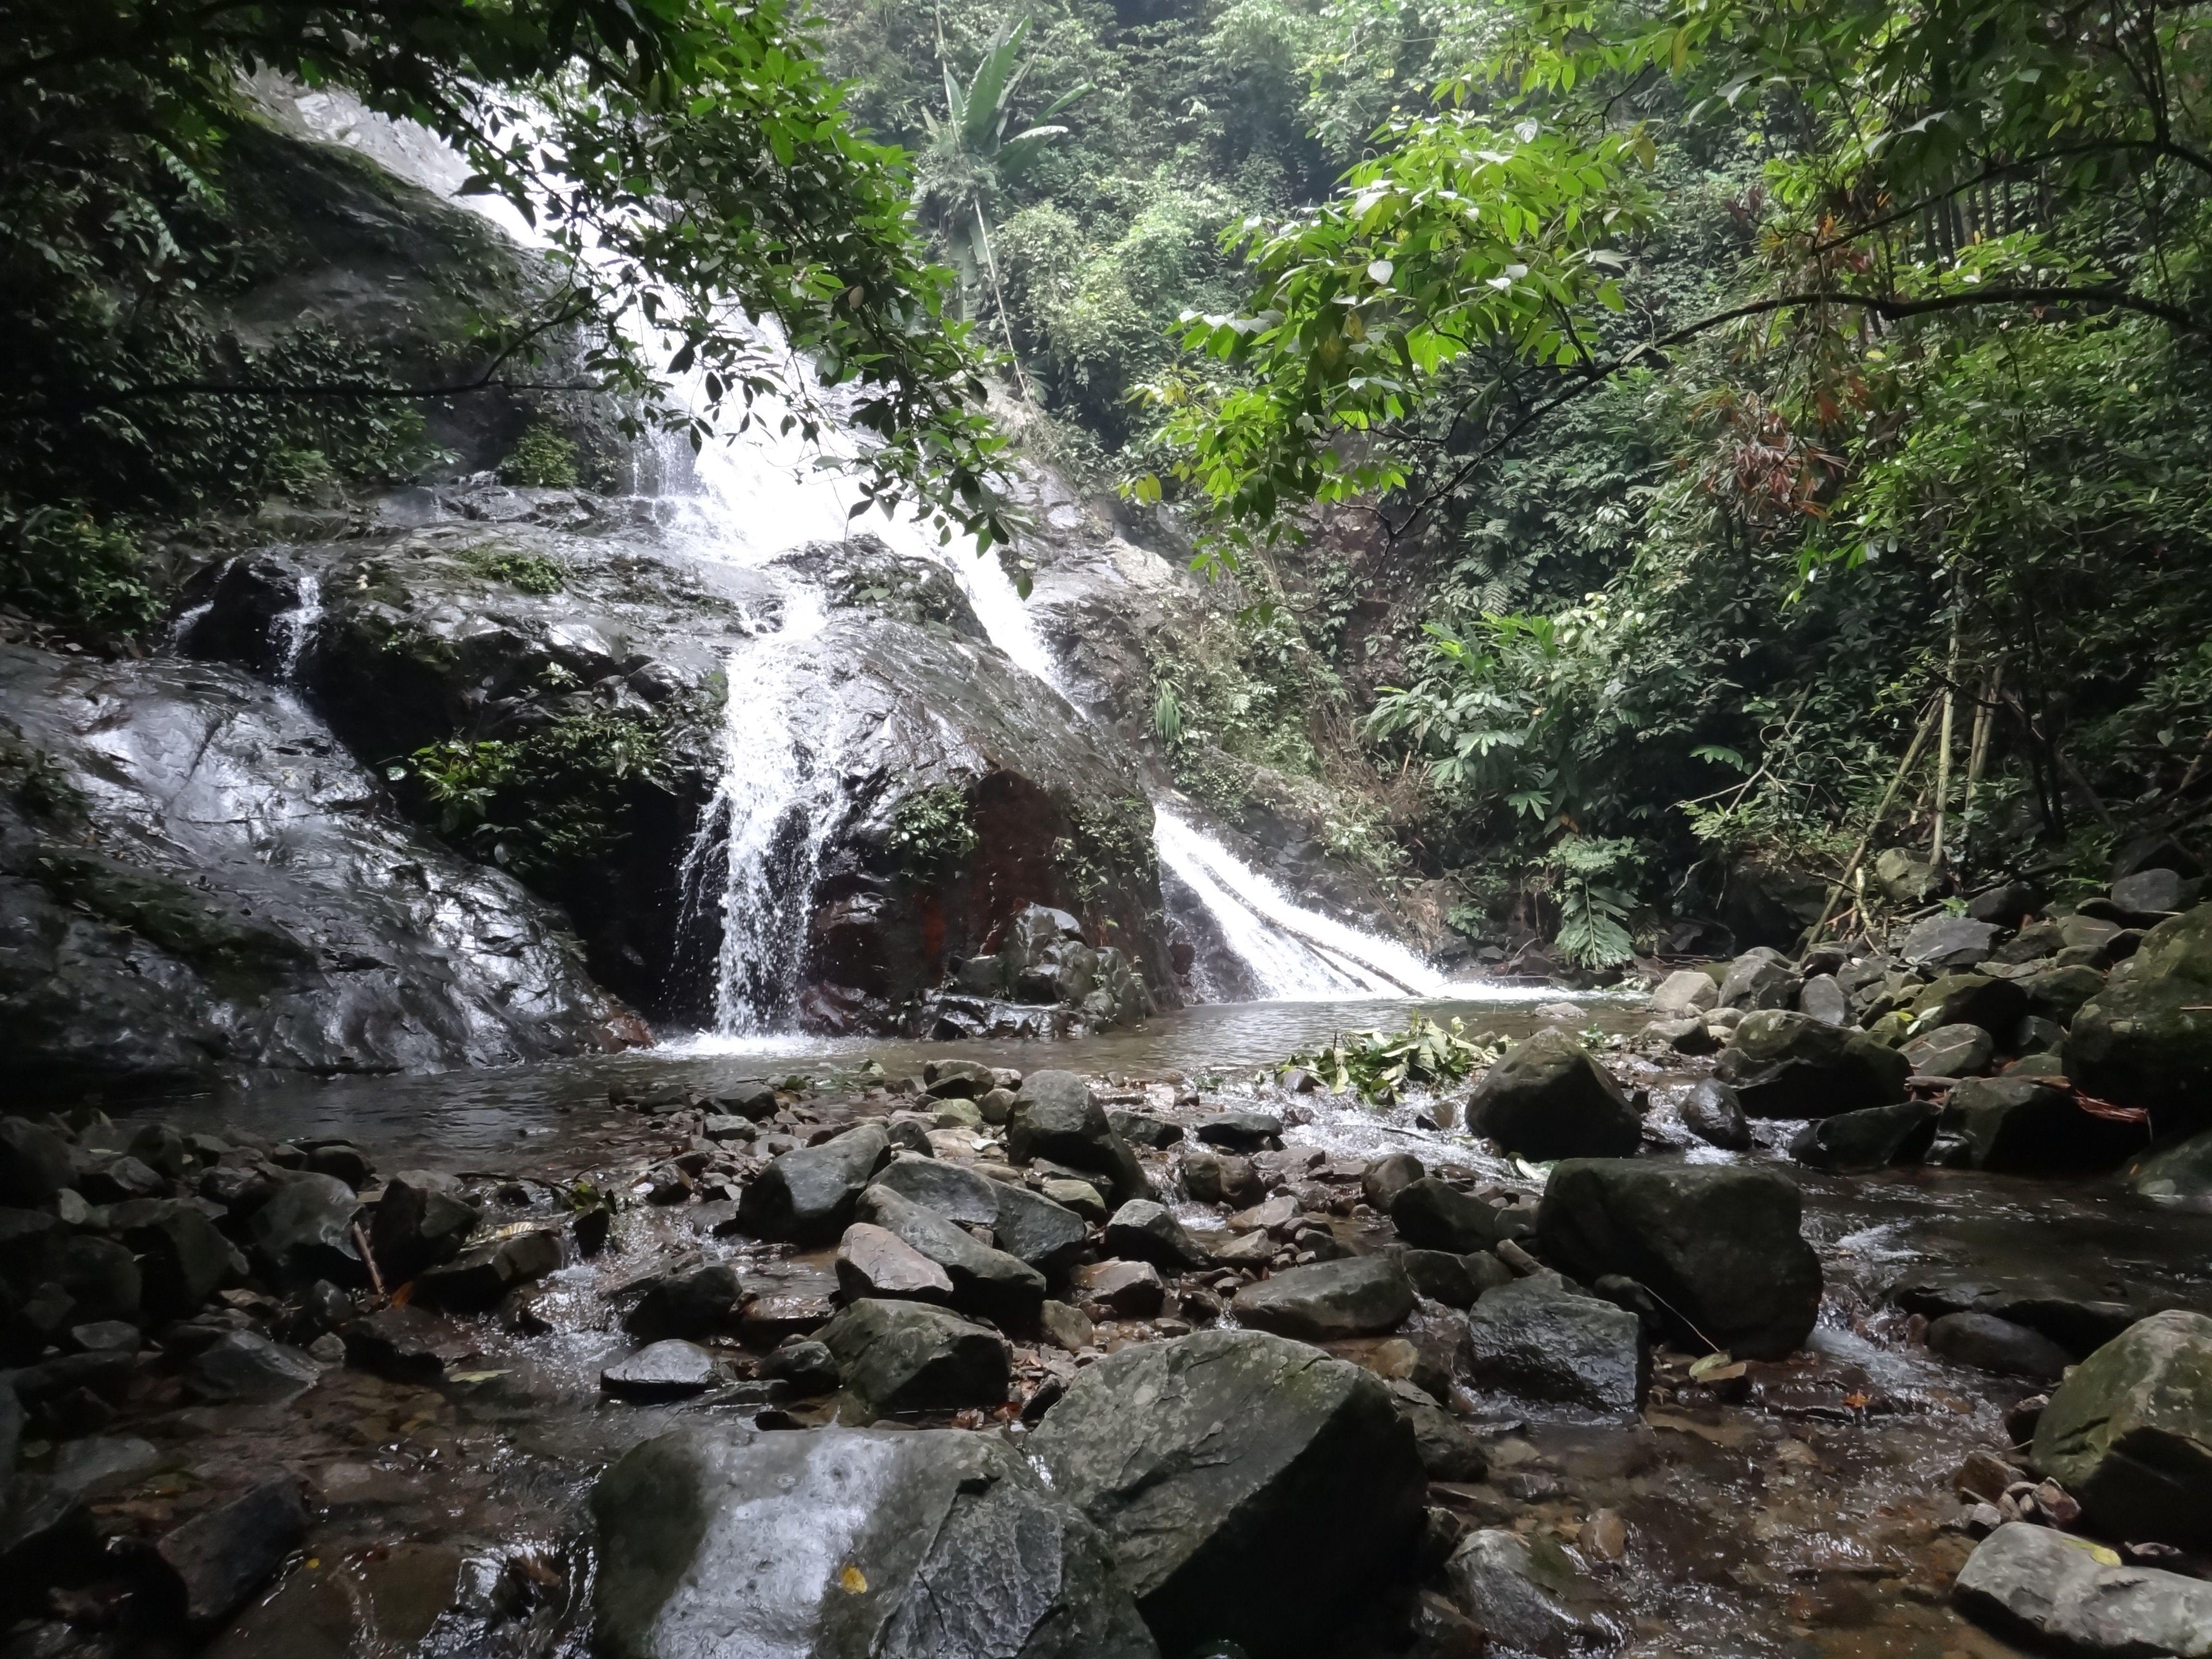 Waterfall at Mount Nuang via Janda Baik route, Malaysia